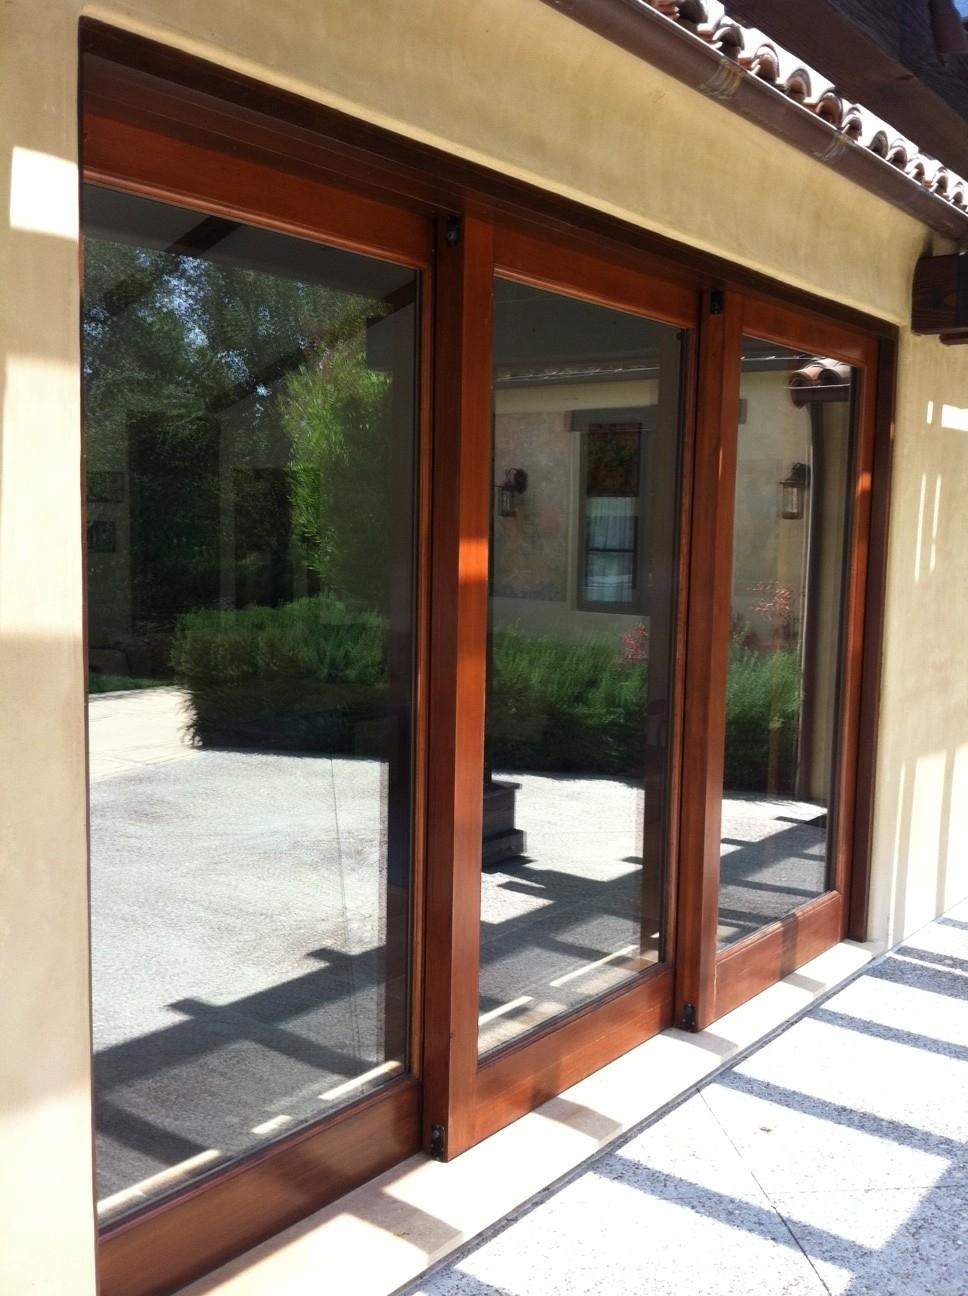 Chief Architect Sliding Glass DoorChief Architect Sliding Glass Door